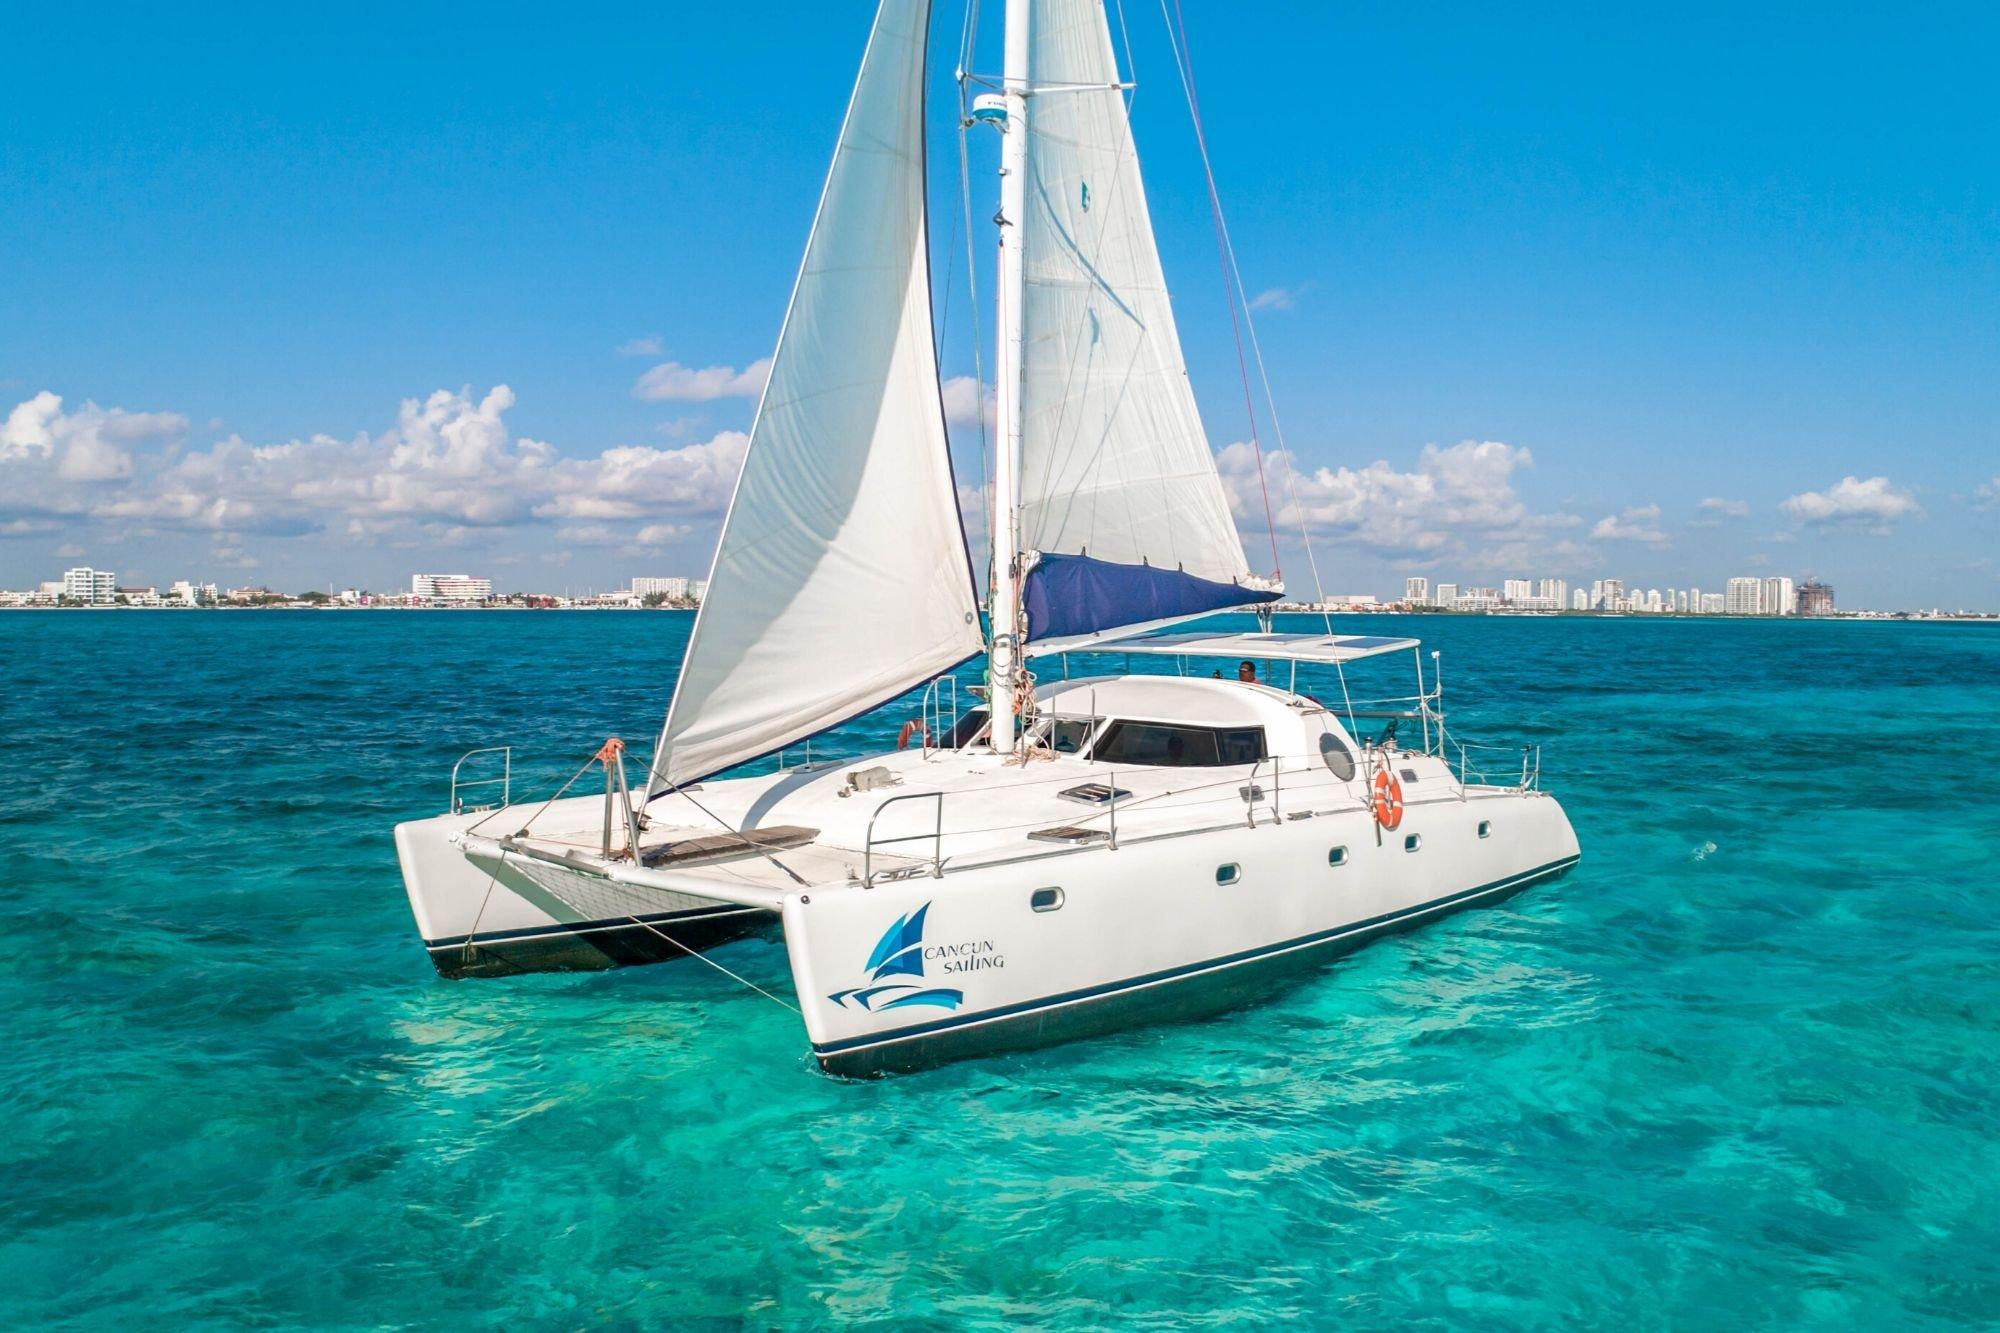 Manta - Isla Mujeres Catamaran Tour - Cancun Sailing 4